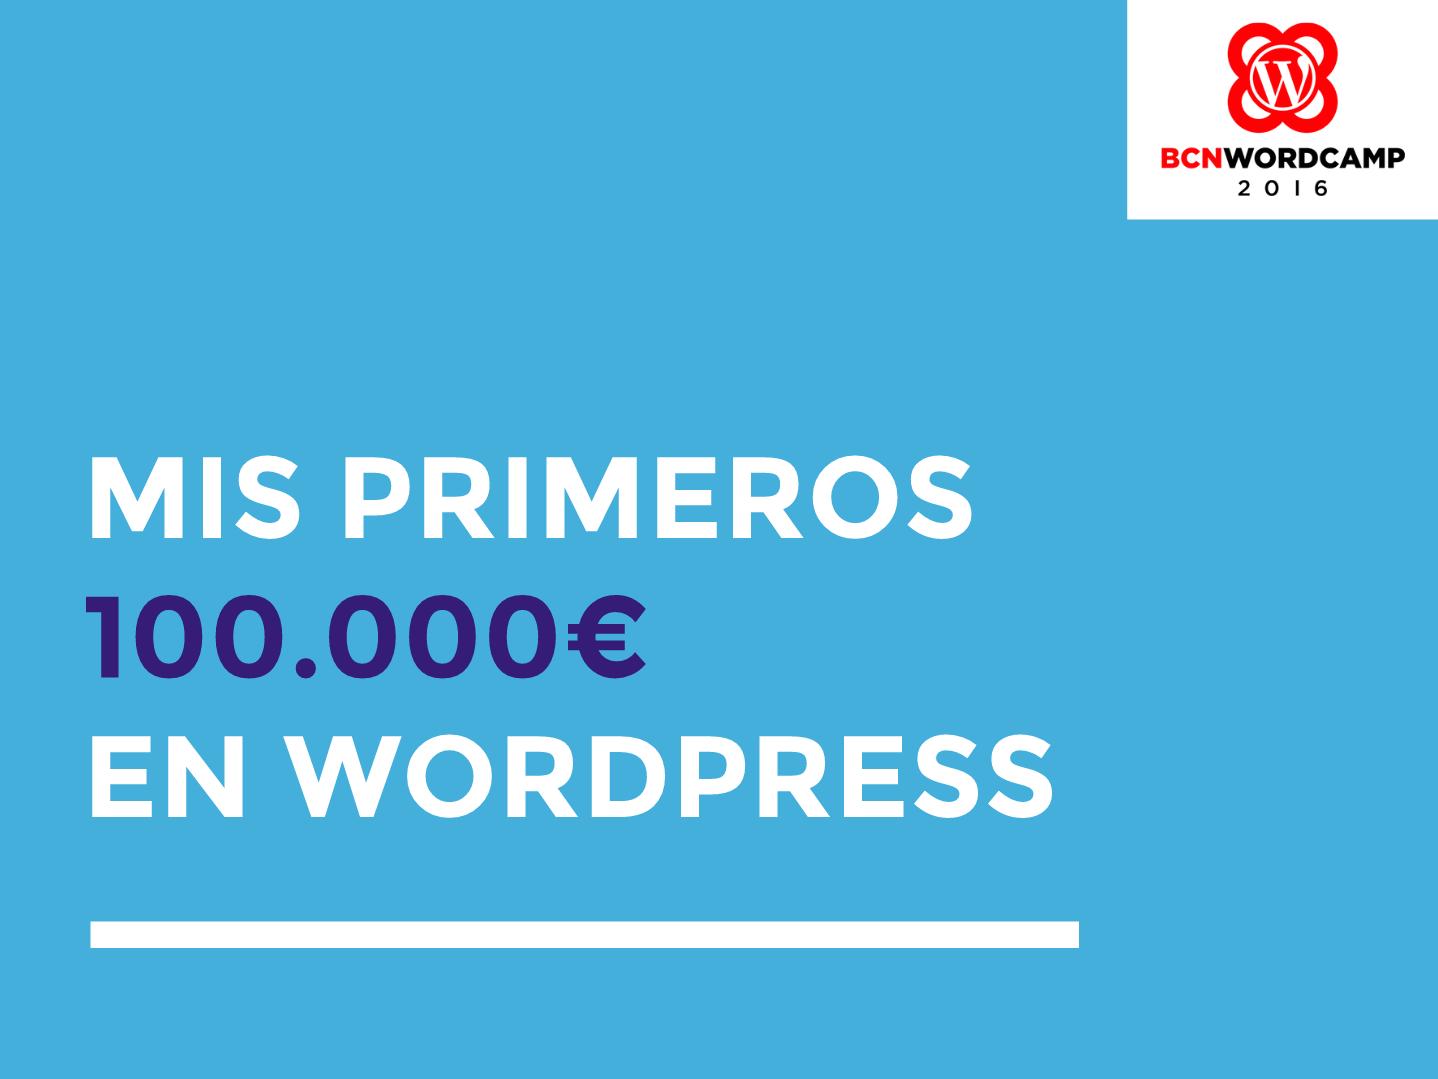 Mis primeros 100.000€ en WordPress